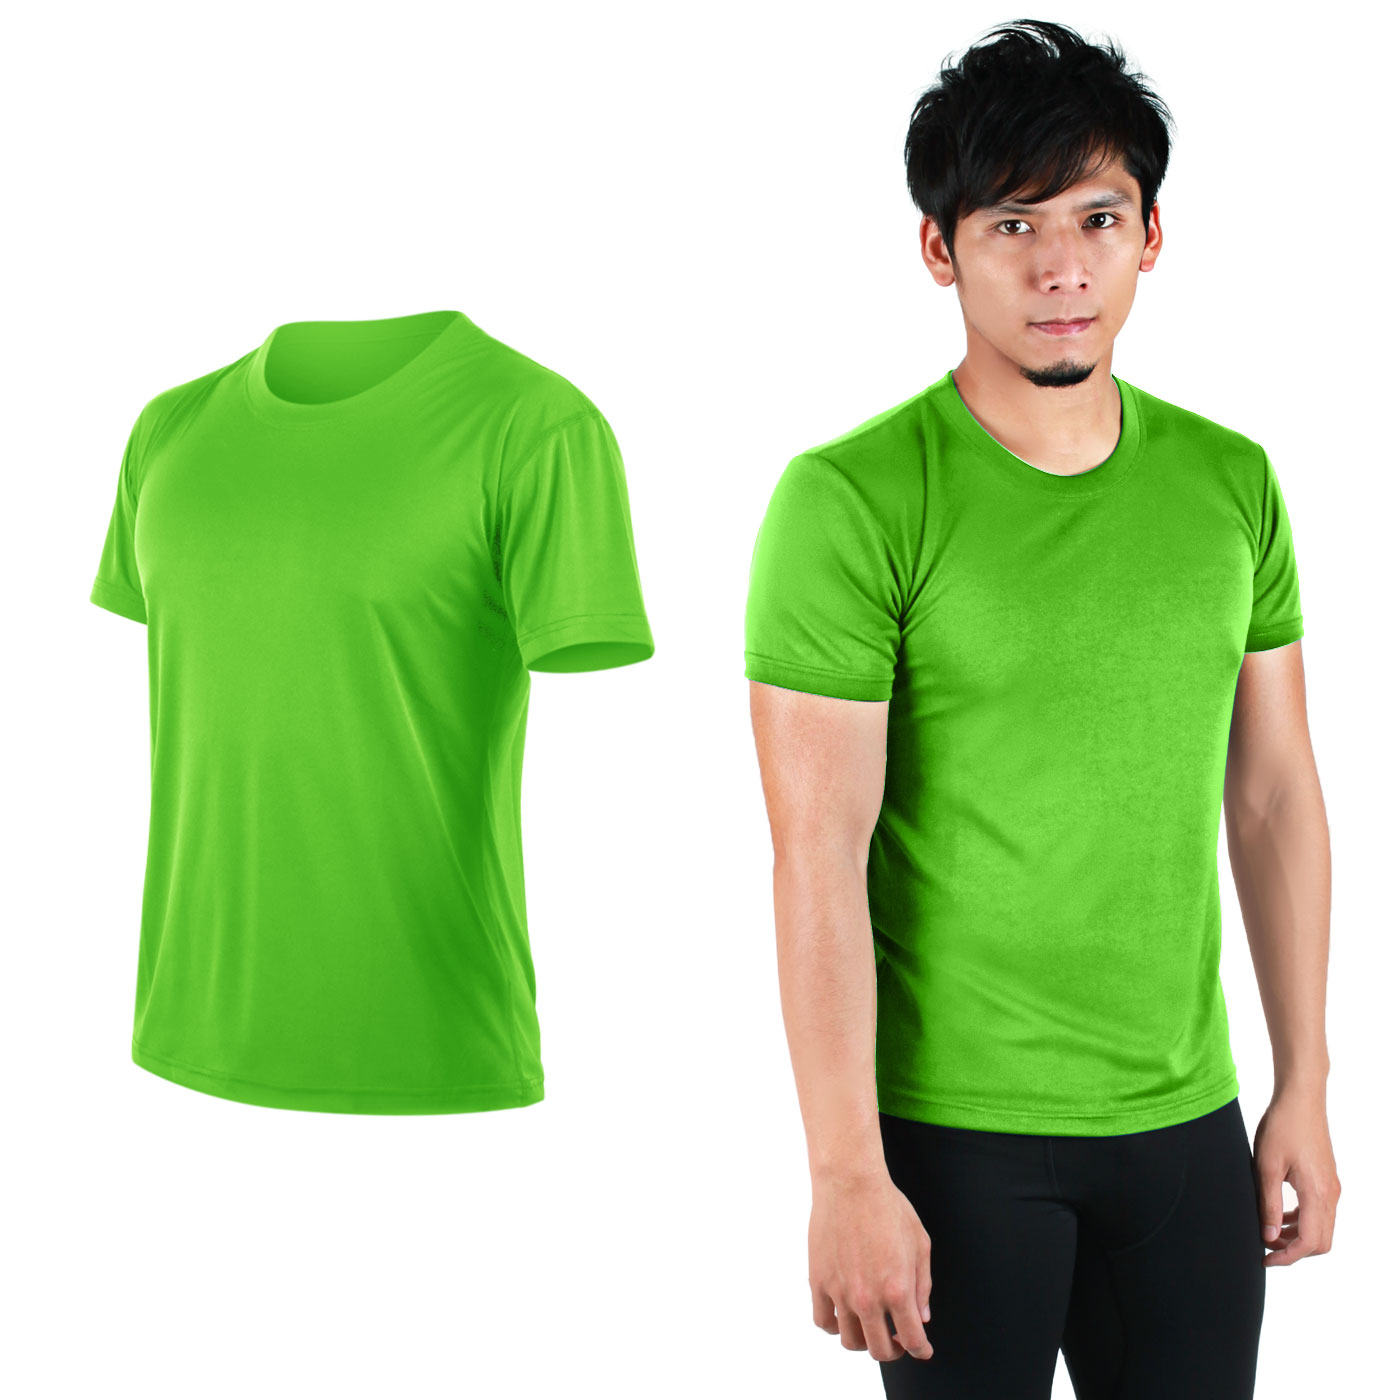 HODARLA FLARE 100 吸濕排汗衫3108301 - 翠綠